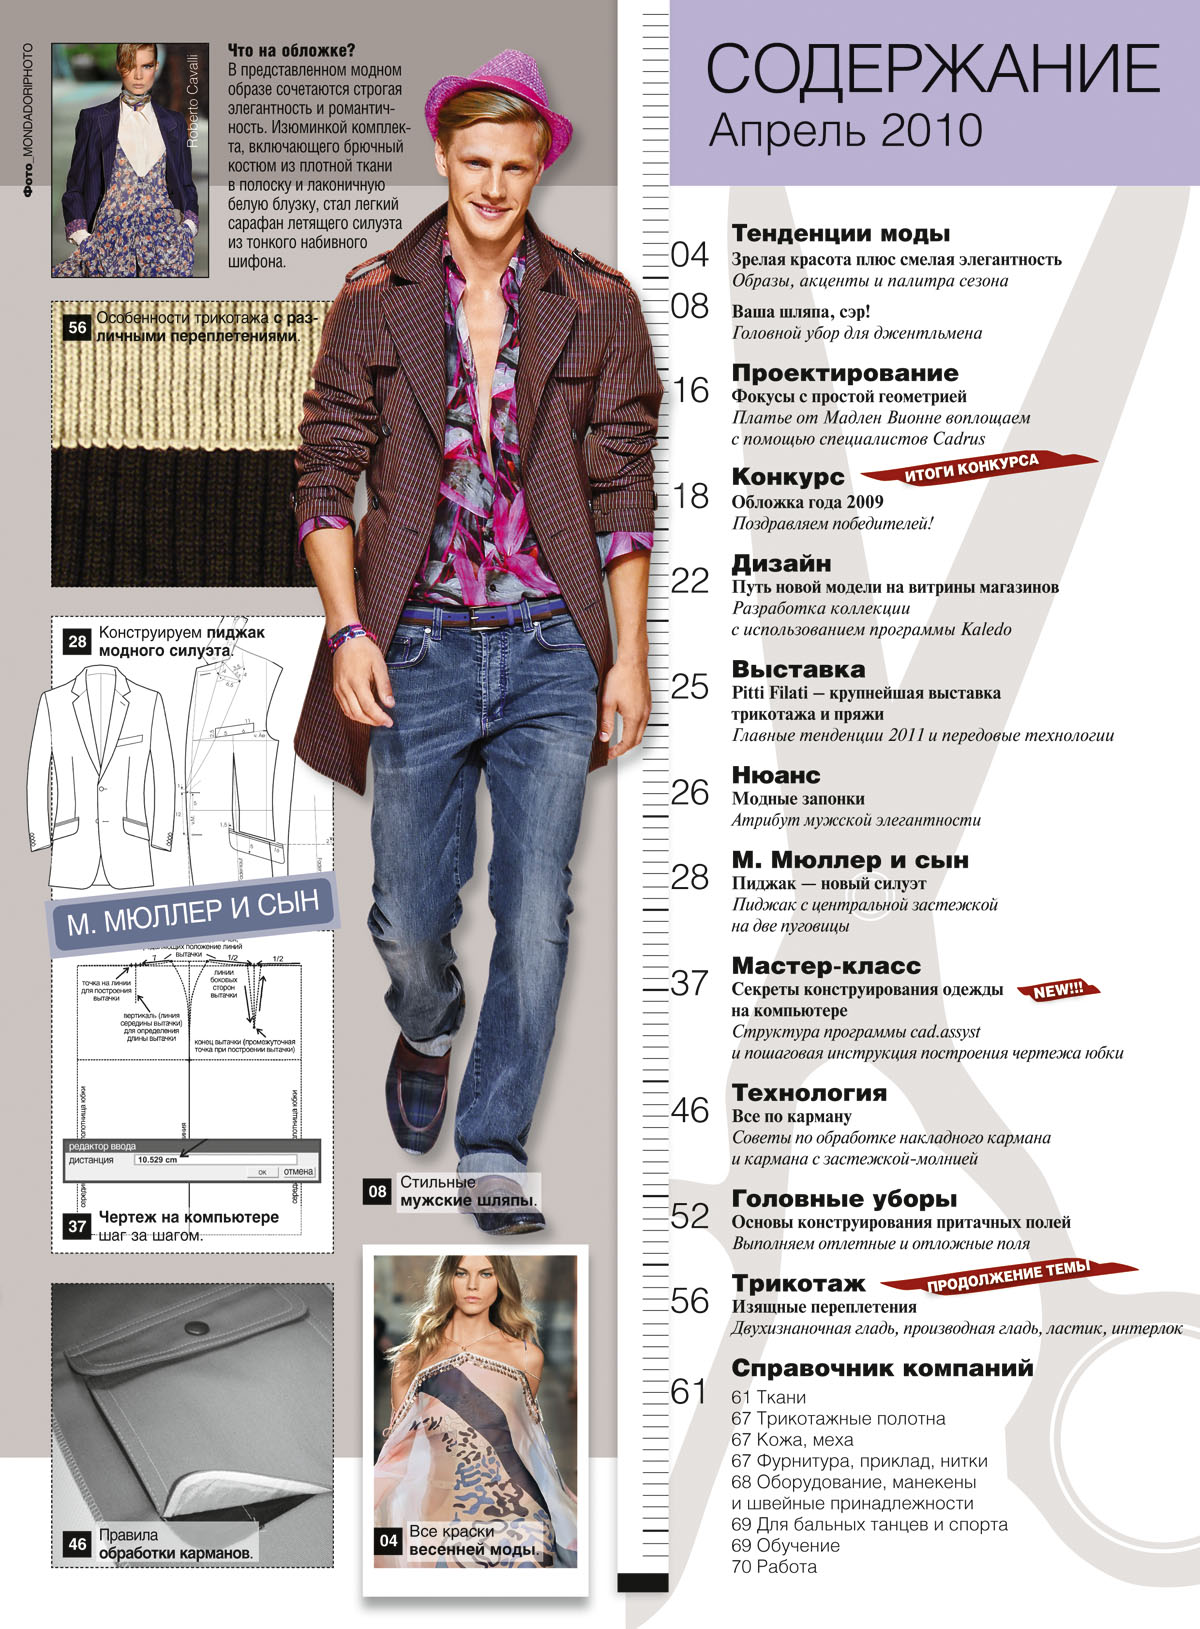 Журнал «Ателье» № 04/2010 (апрель) (16959.Atelier.2010.04.content.jpg)